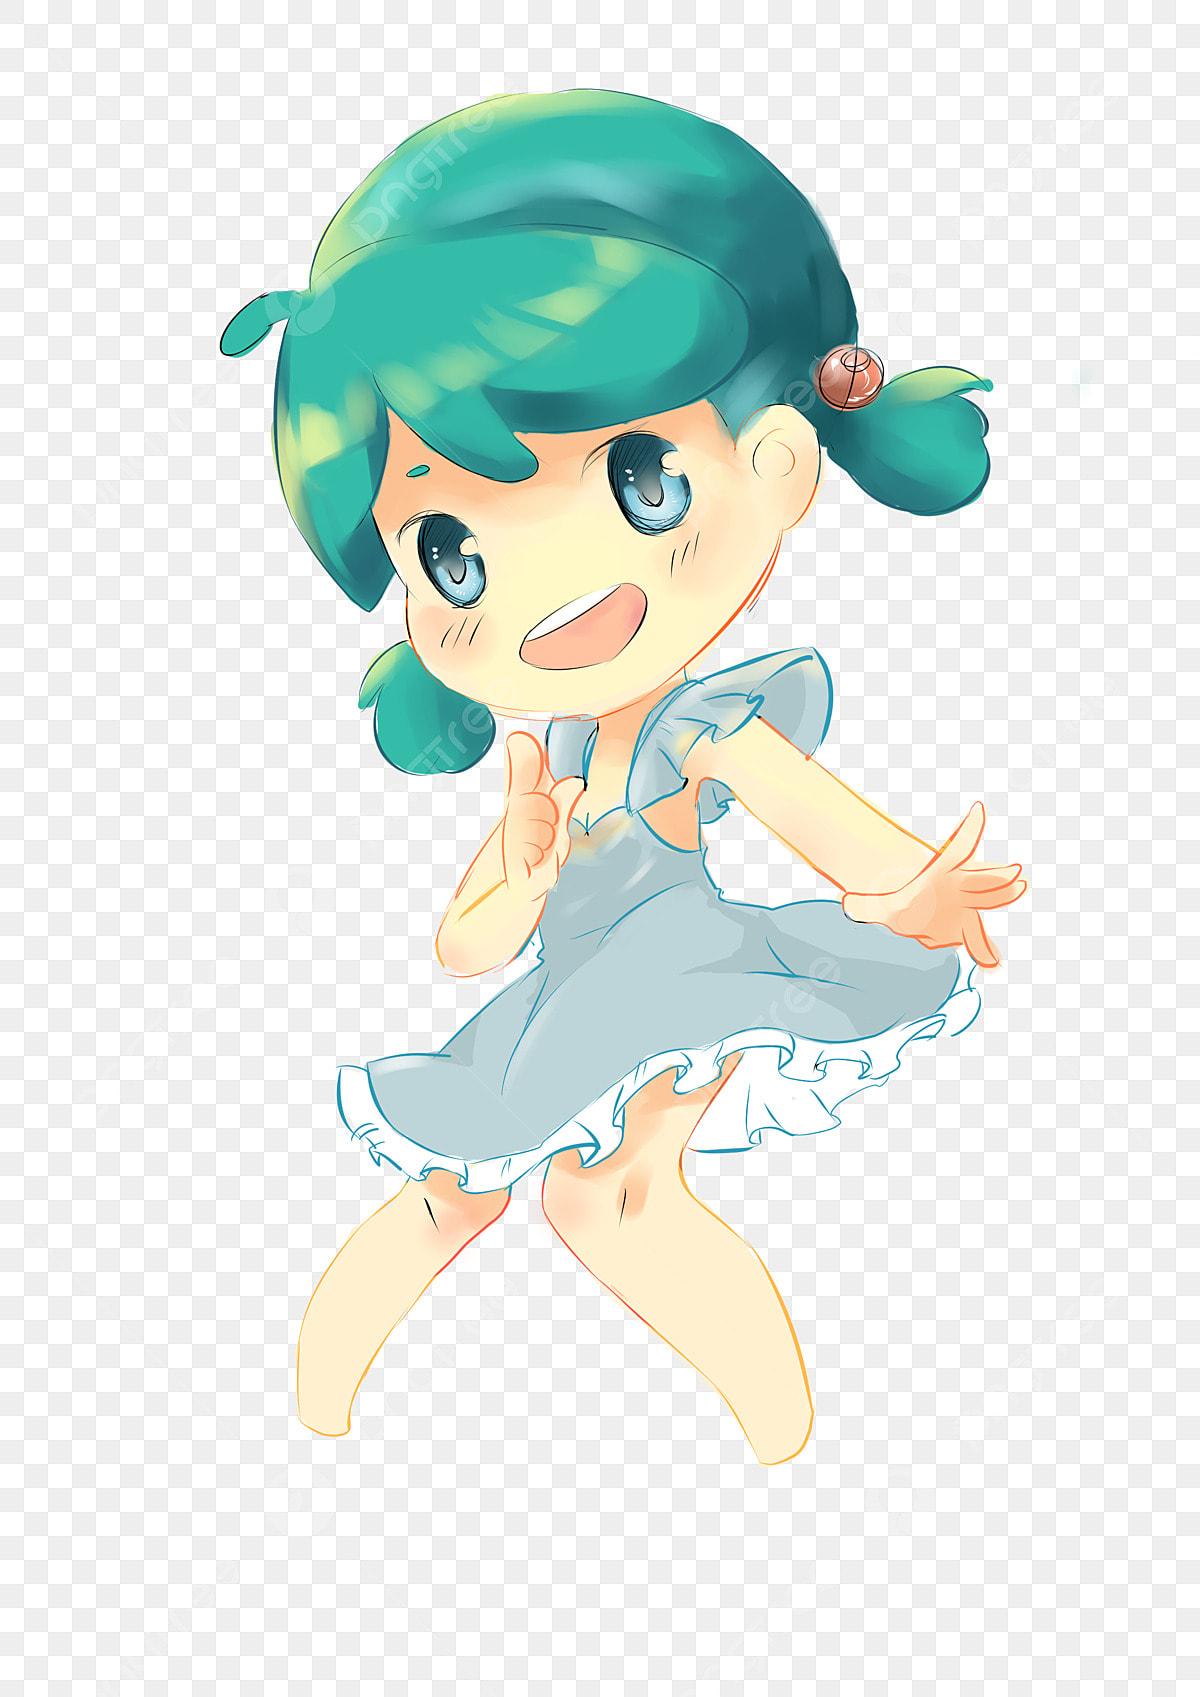 Japanese Teenage Girl Hand Drawn Illustration Cartoon Anime Blue